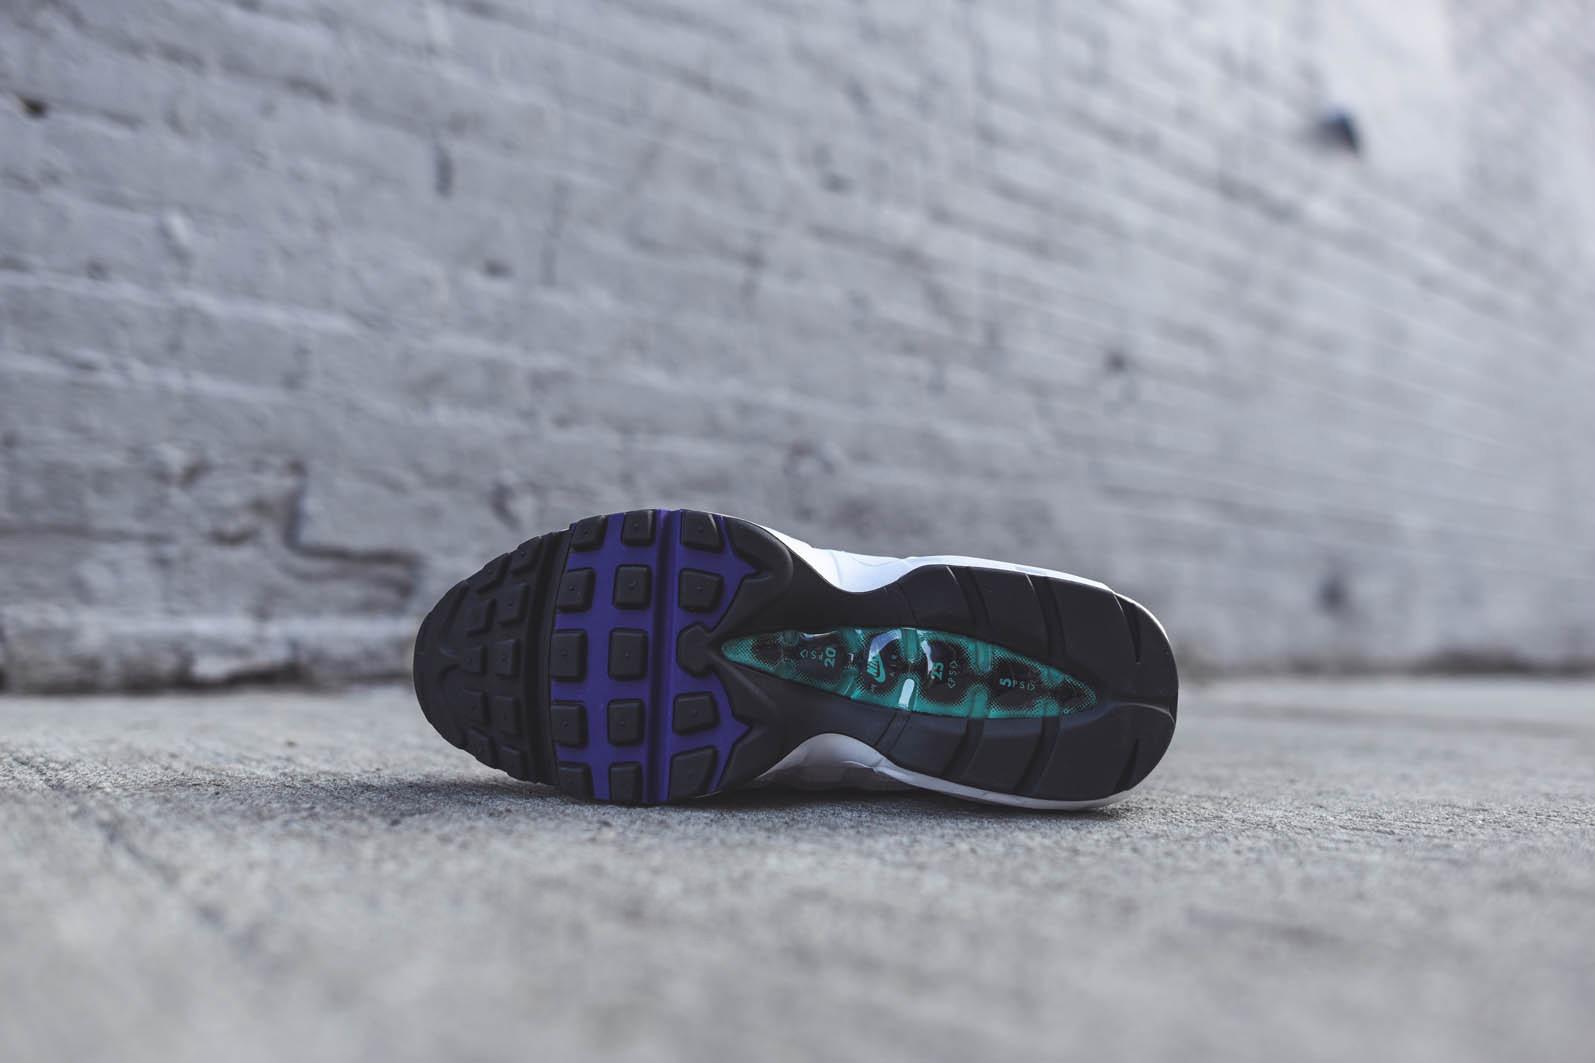 Nike Air Max 95 - Negro / Gris Lobo - Corte Retro Púrpura QKEcW